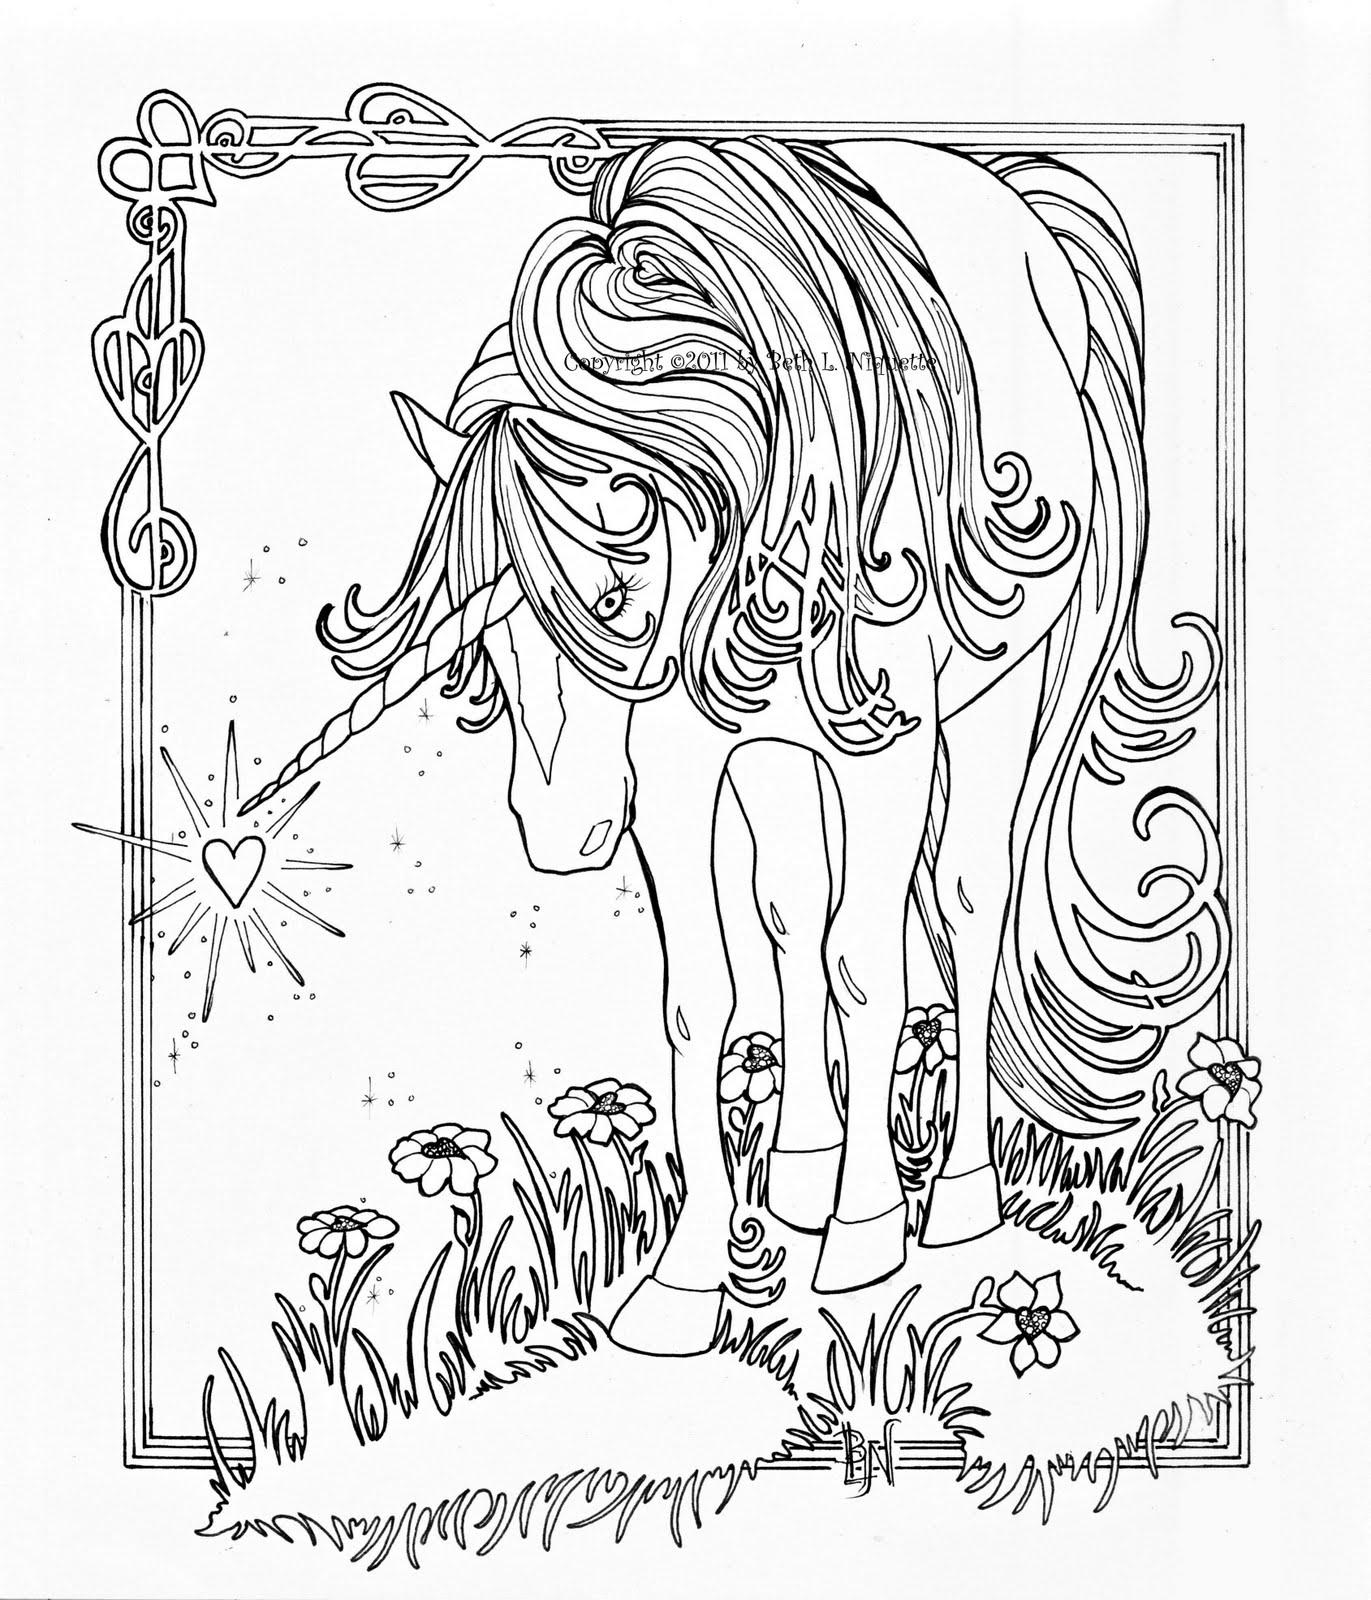 coloring page unicorn downloadable unicorn colouring page michael o39mara books coloring page unicorn